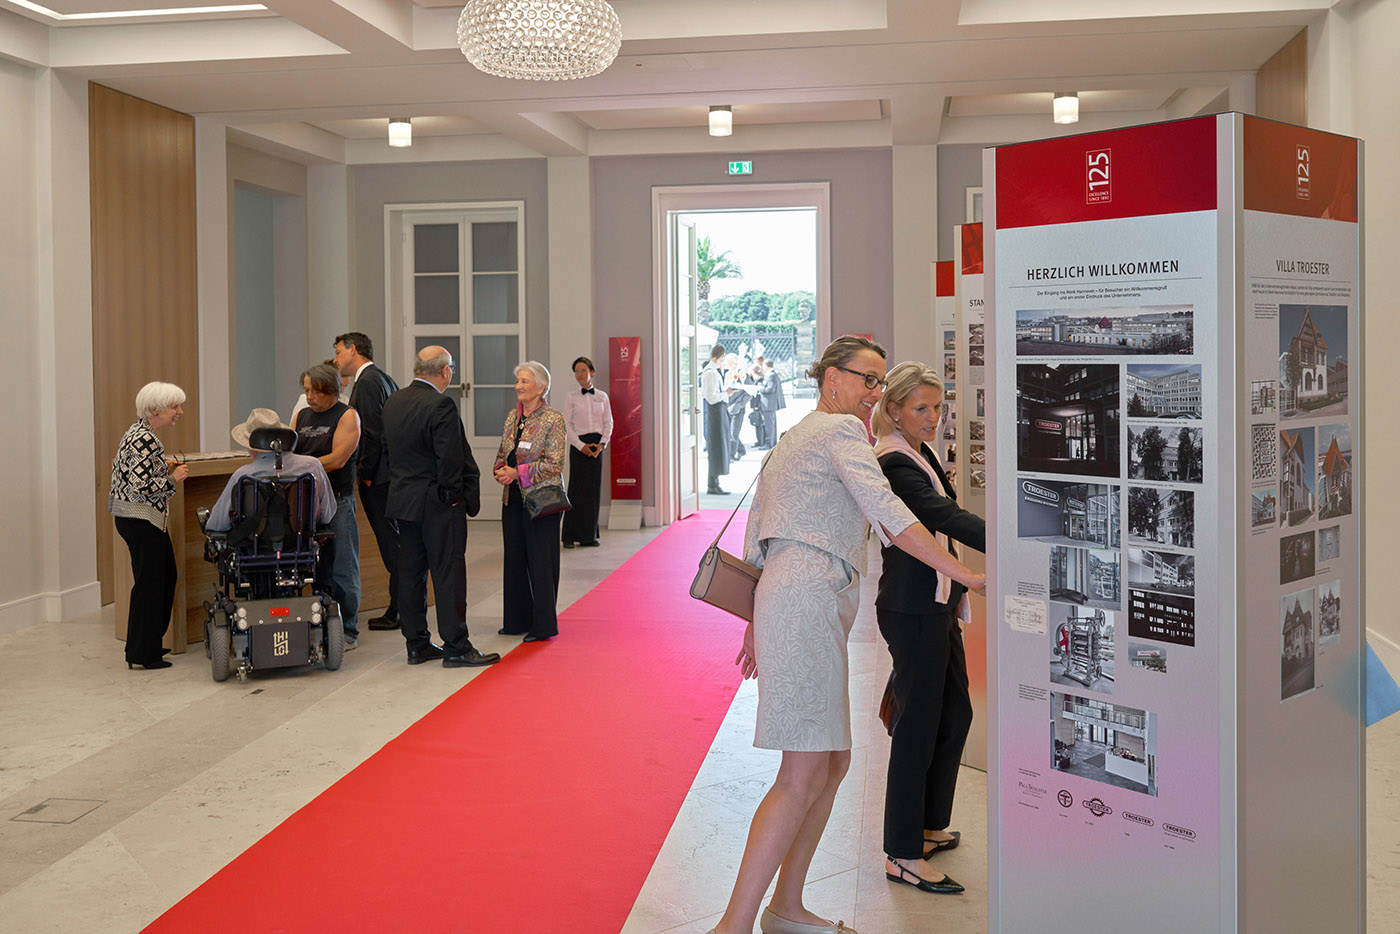 Event Veranstaltung Jubiläum Festakt branding  corporate graphicdesign anniversary Photography  rotherdesign